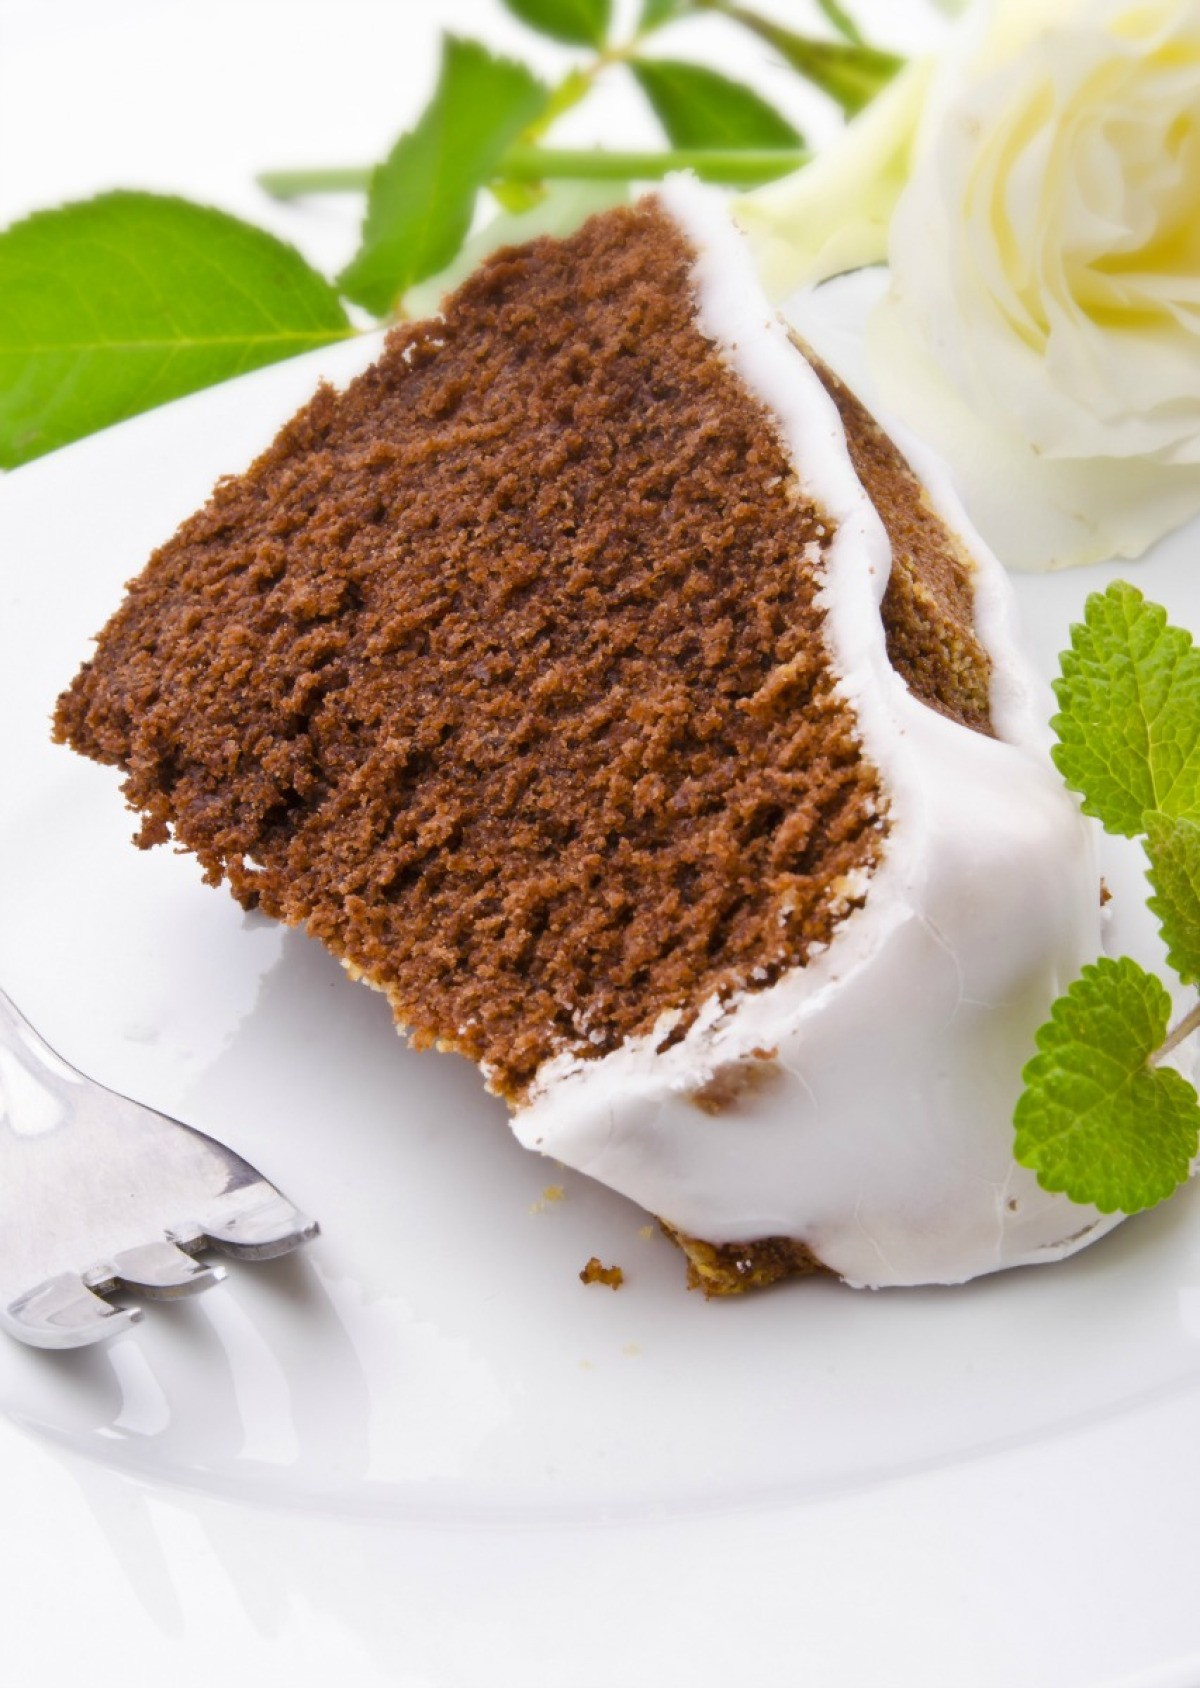 Chocolate Zucchini Cake Recipes   ThriftyFun